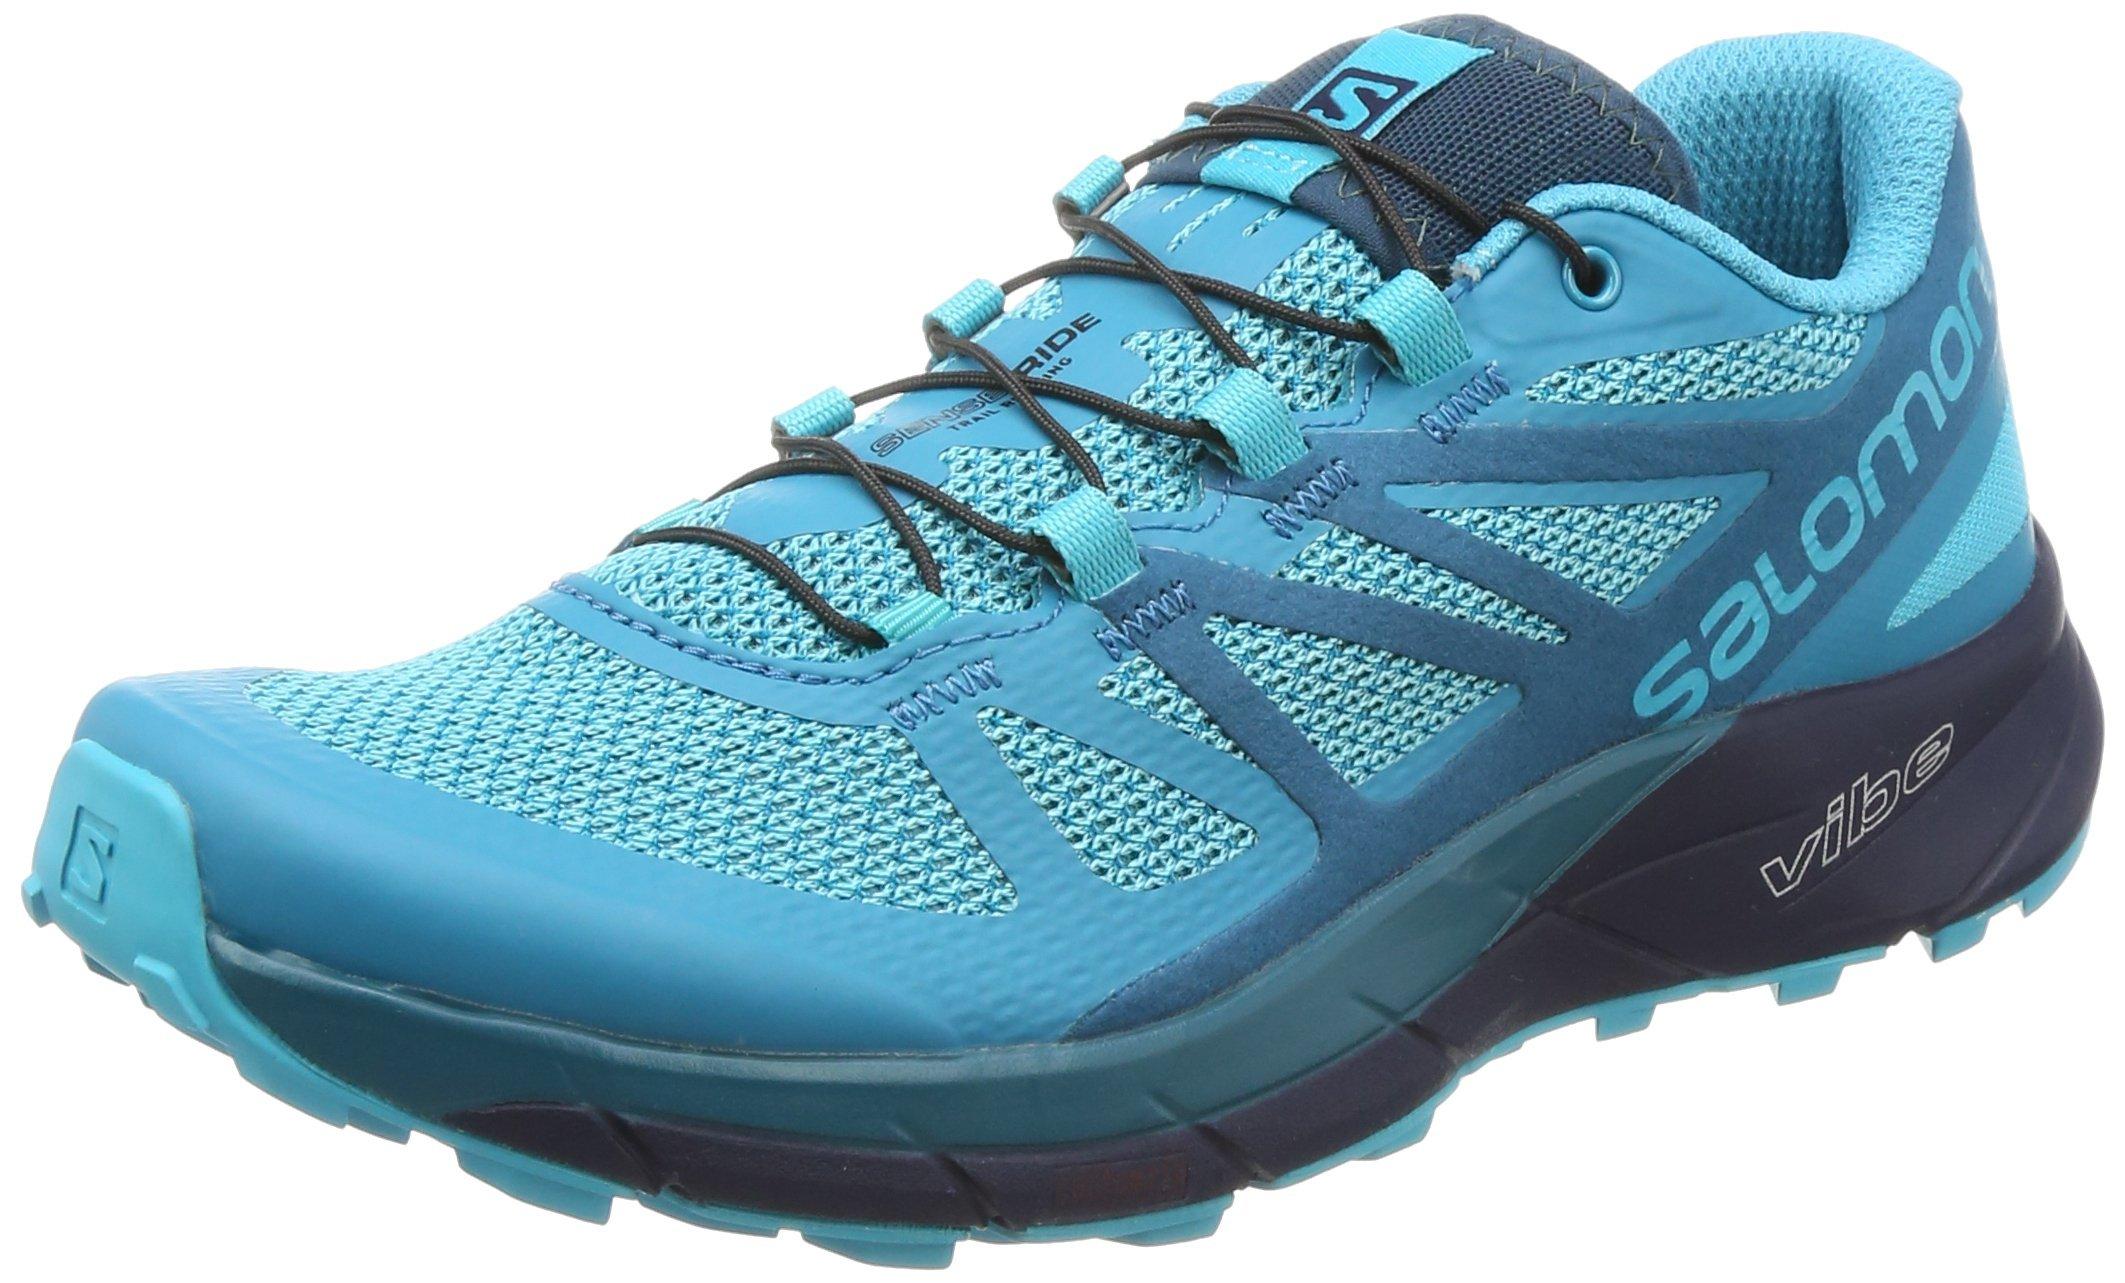 Salomon Sense Ride Running Shoe - Women's Blue Bird/Deep Lagoon/Navy Blazer 7 by Salomon (Image #1)